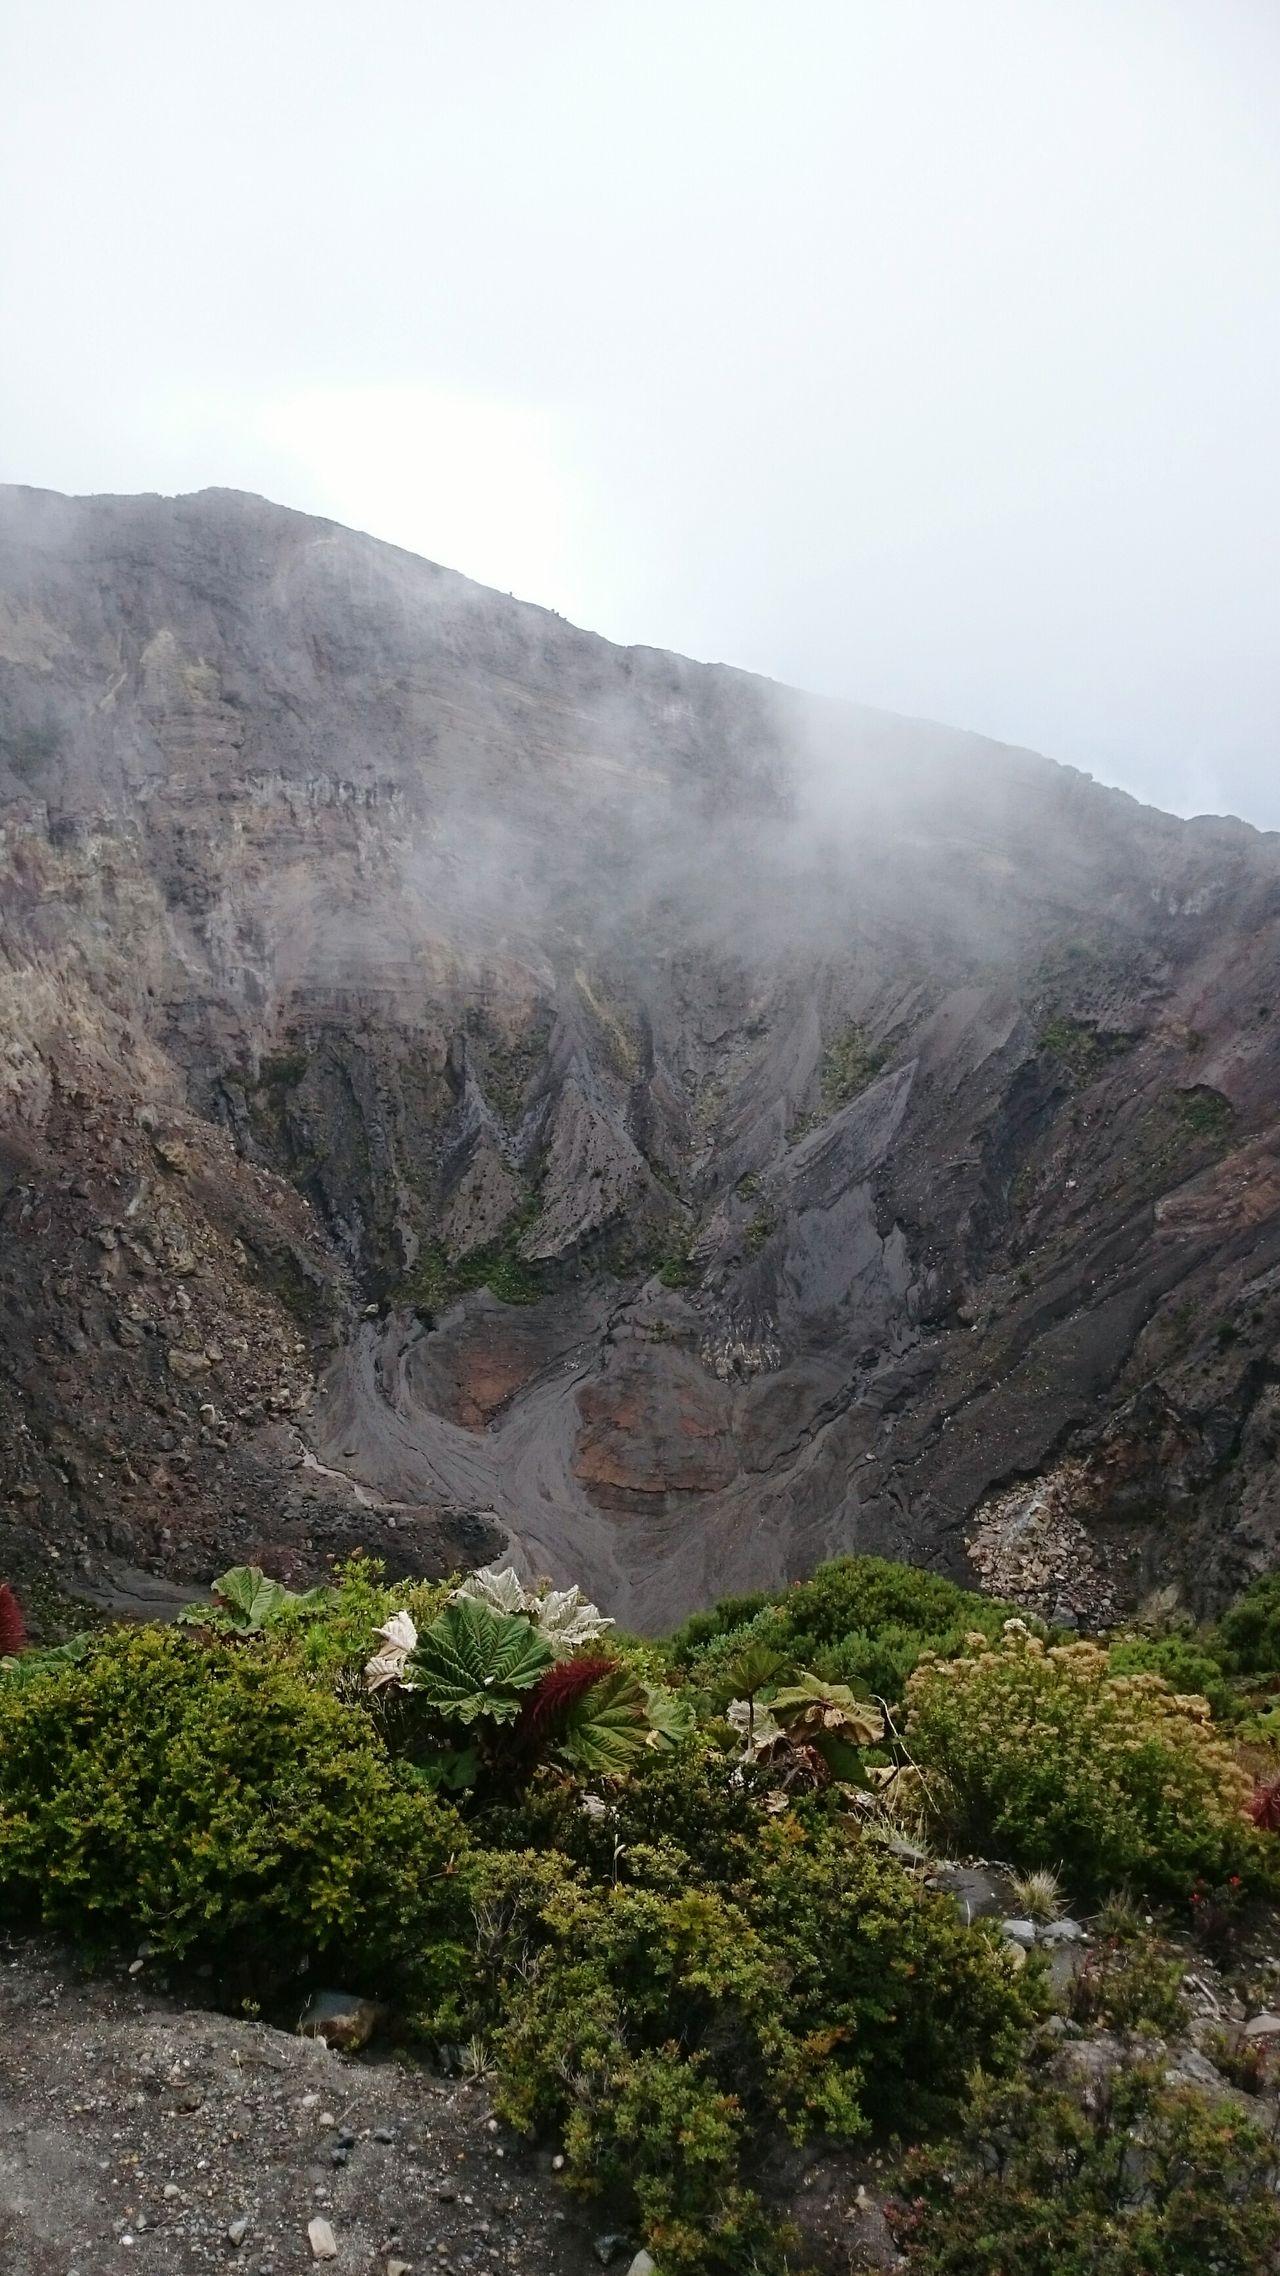 Nature Landscape Mountain Outdoors Scenics Plant Costa Rica Costarica Nature Volcano Irazu Costa Rica Irazu Volcanic Rock Sand Flower Day Pura Vida ✌ Puravida